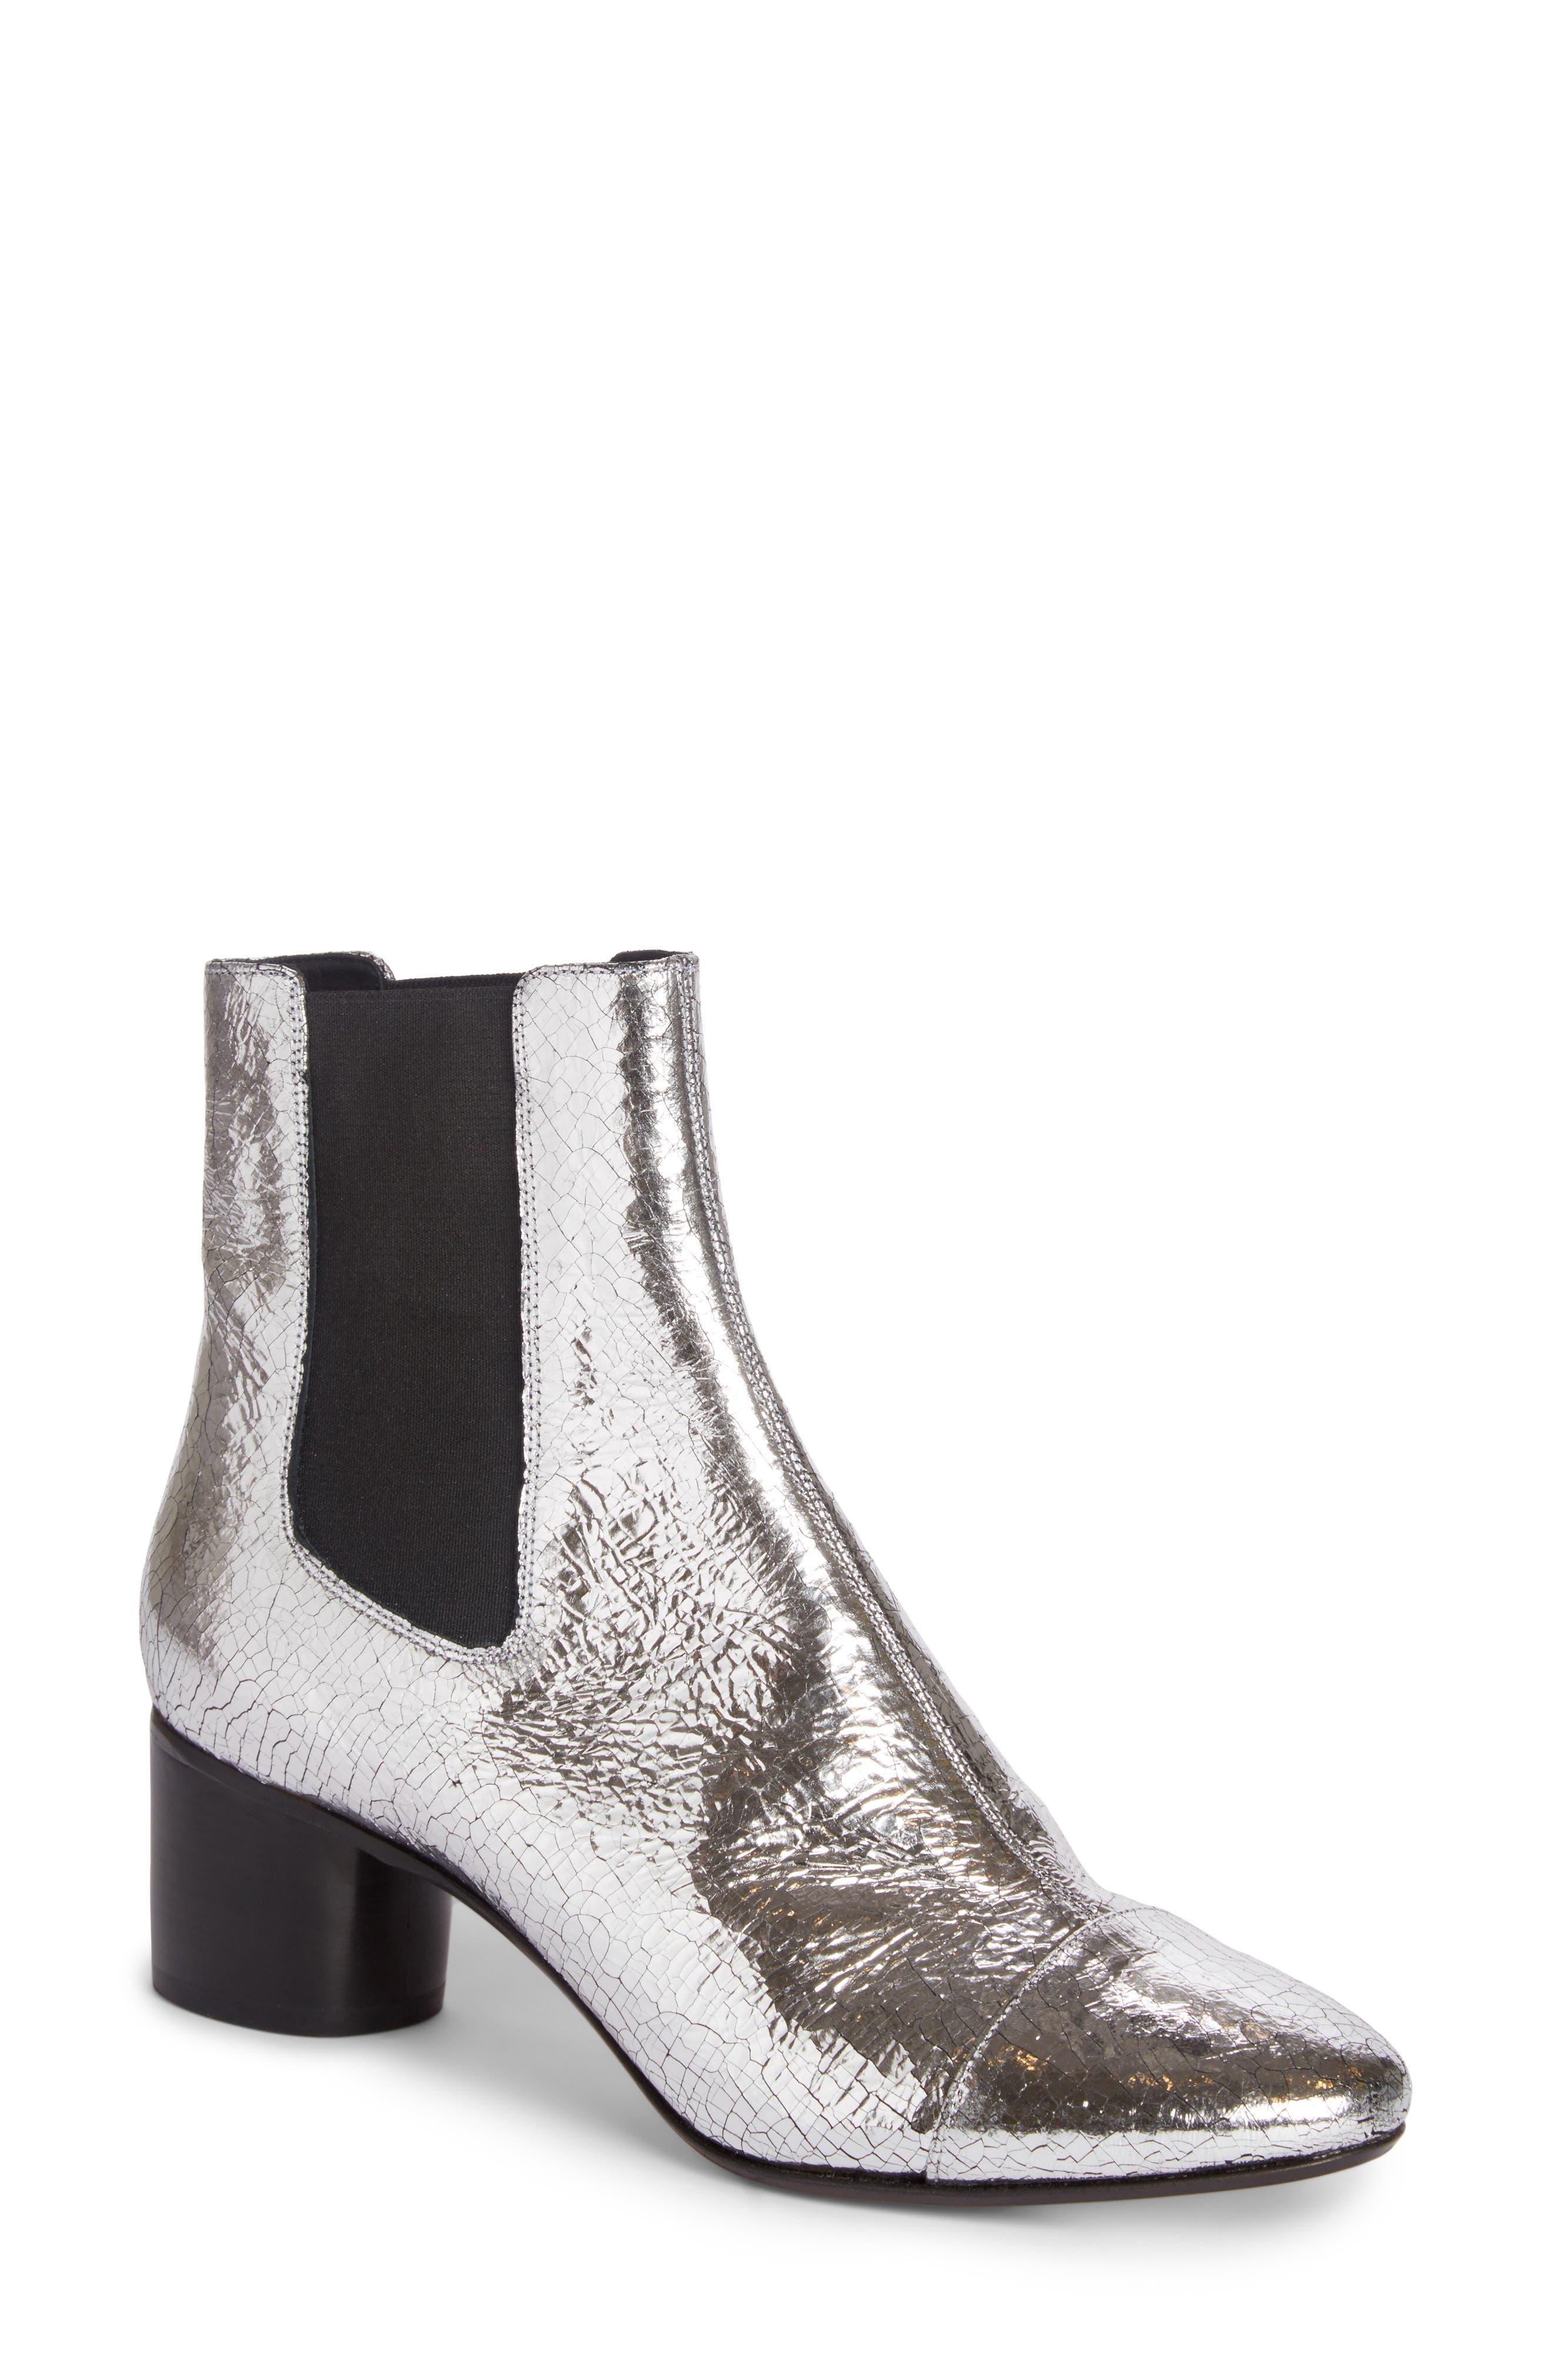 Alternate Image 1 Selected - Isabel Marant Danelya Chelsea Boot (Women)